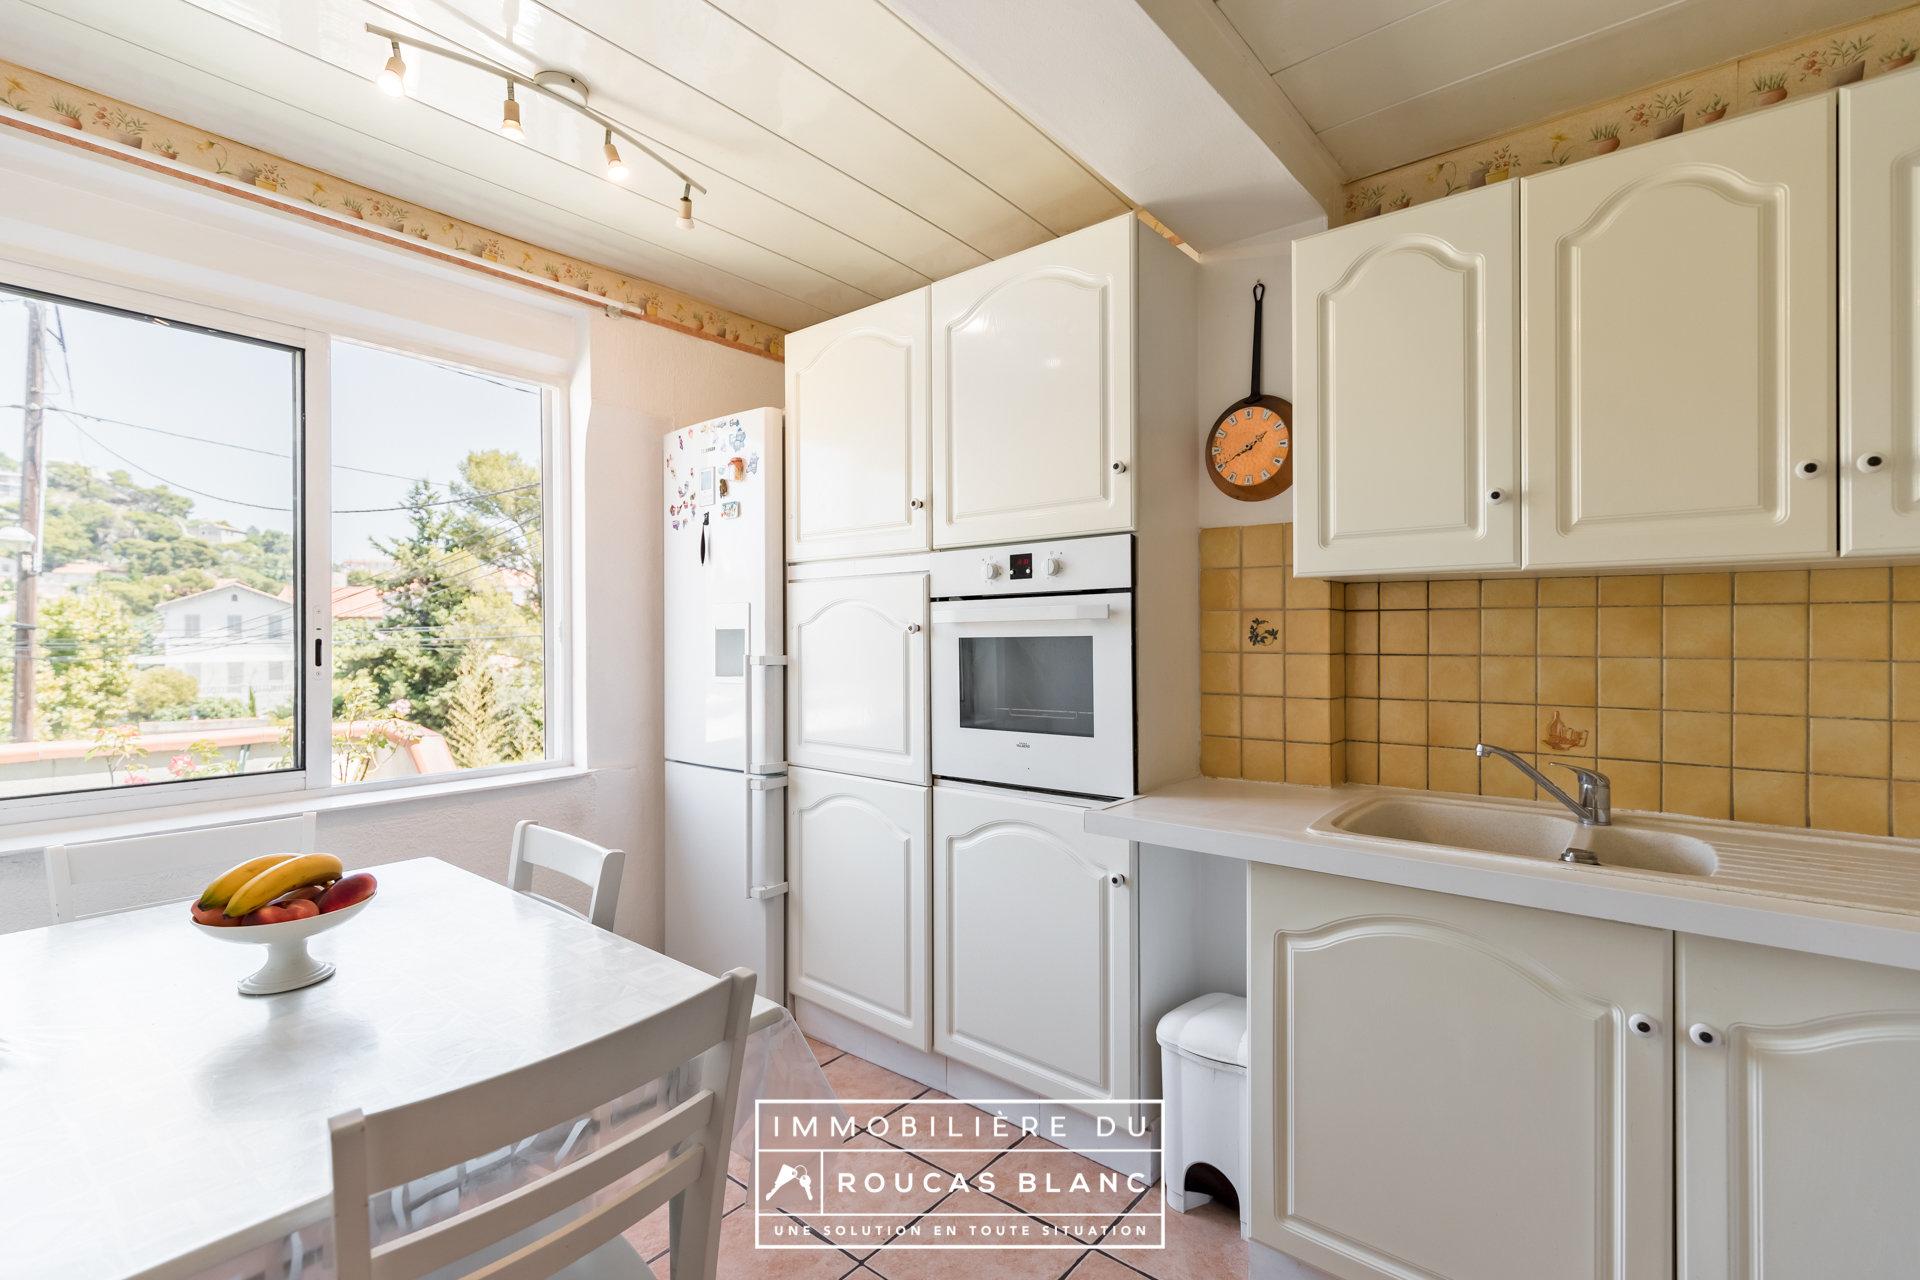 Maison - Coeur Roucas - Garage - Terrasses - Calme absolu